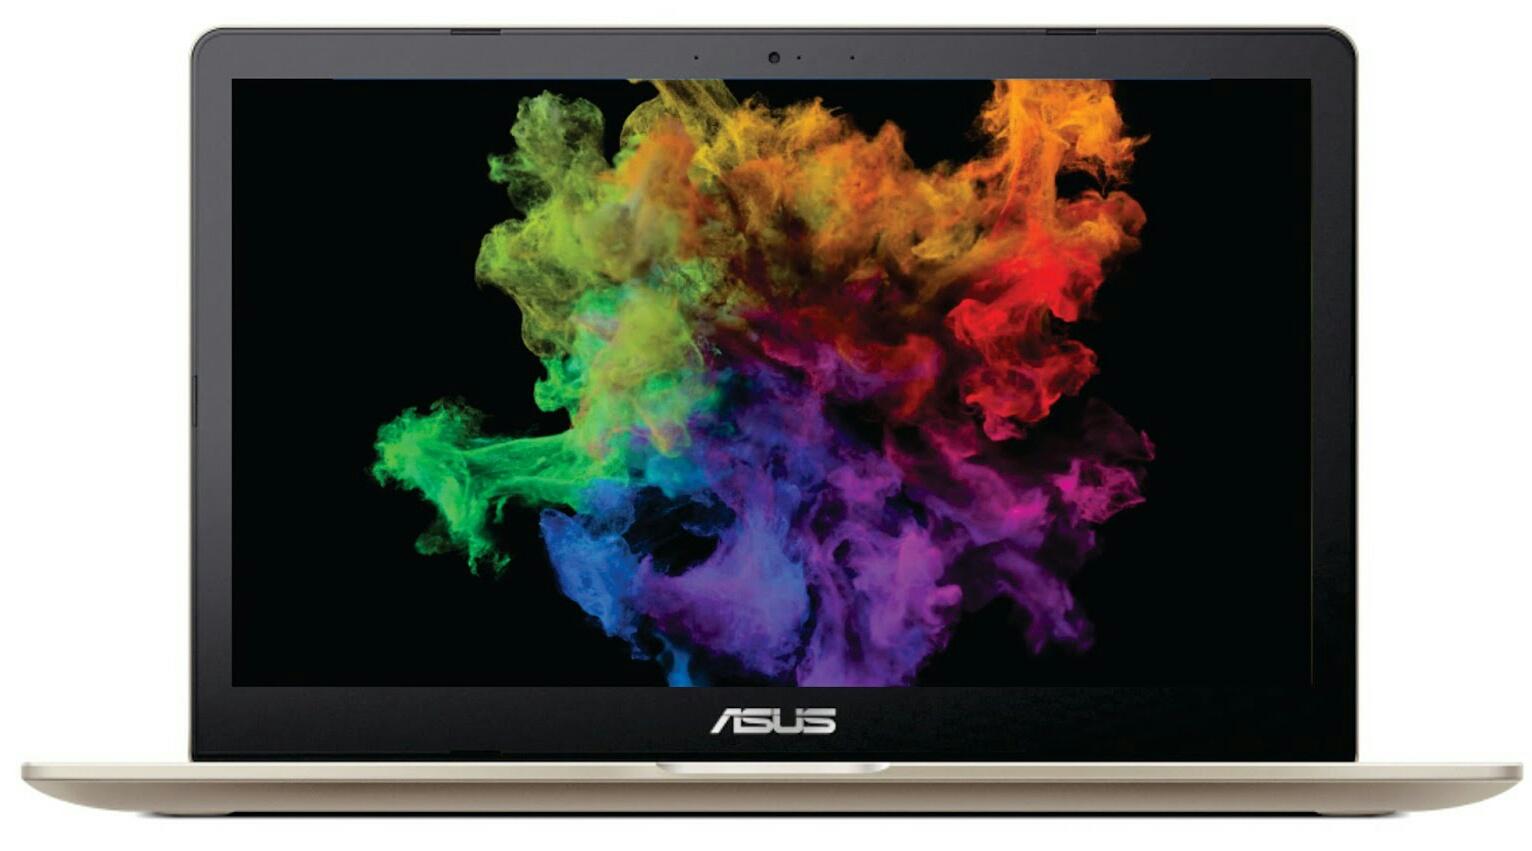 Virtualisasi visual ASUS Vivobook Pro 15 N580VD